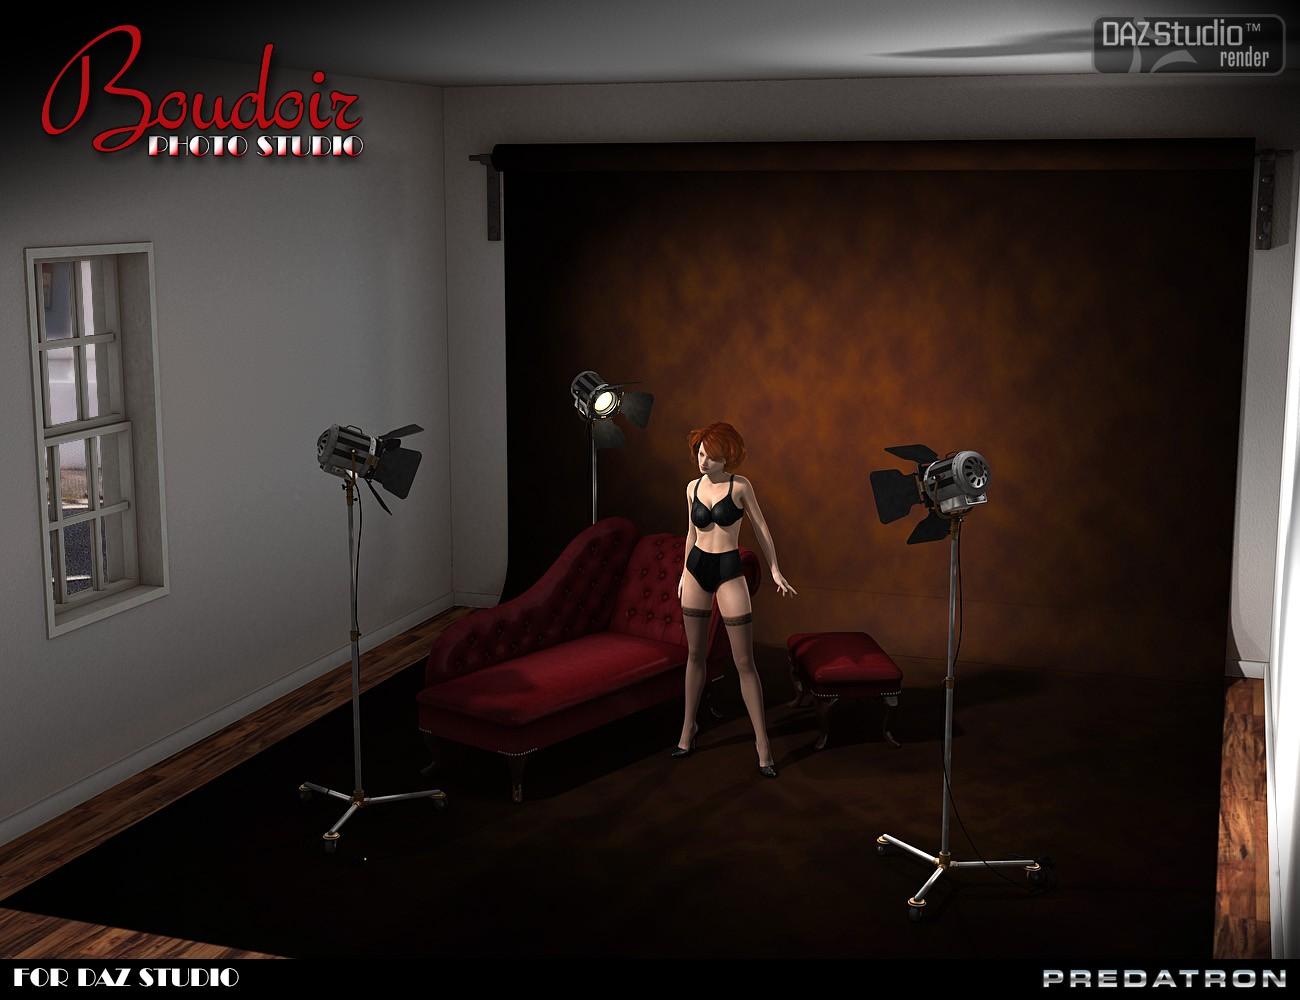 Download Daz Studio 3 For Free Daz 3d Boudoir Photo